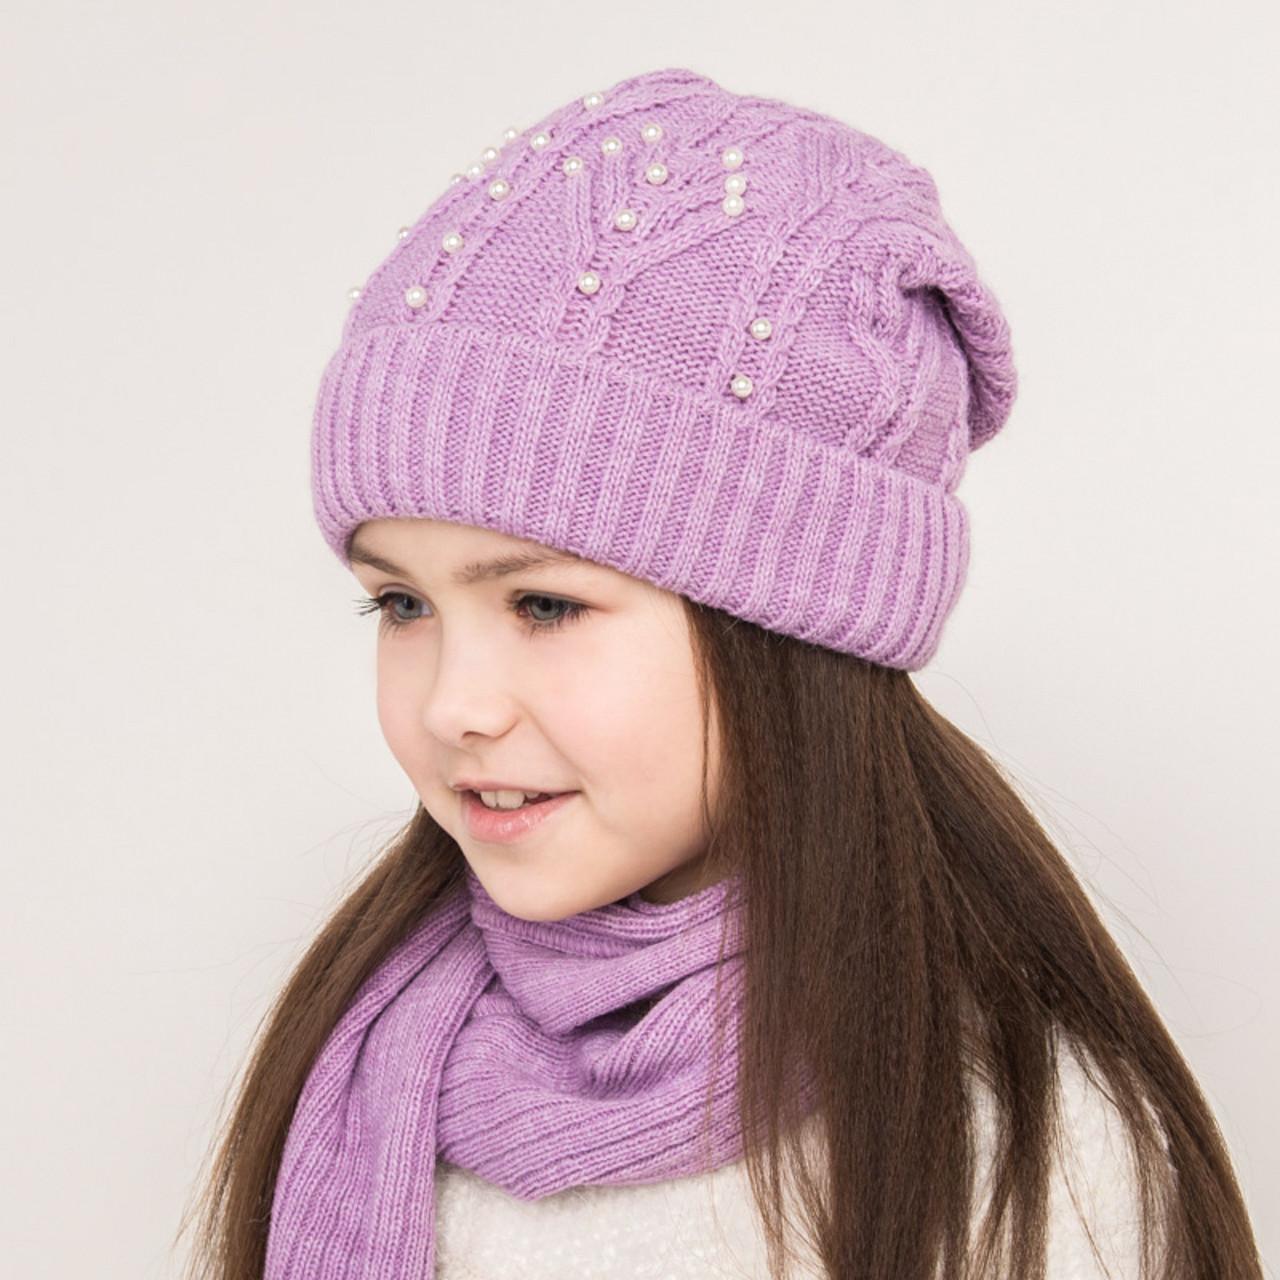 Комплект  для девочки из шапки и хомута с бусинками - Артикул 0858